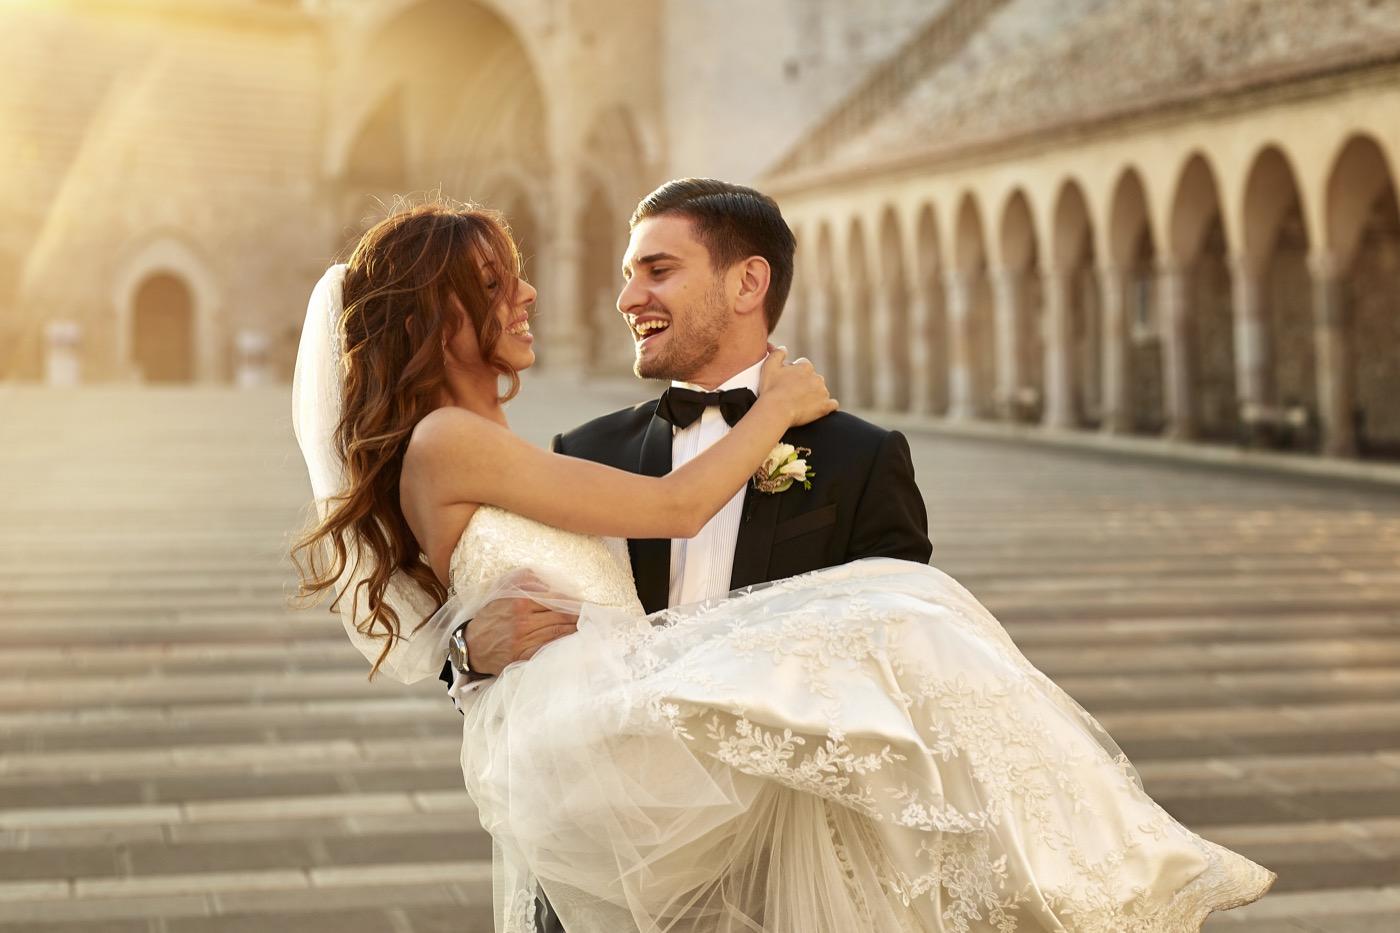 Claudio-Coppola-wedding-photographer-abbazia-7-frati-piegaro-71